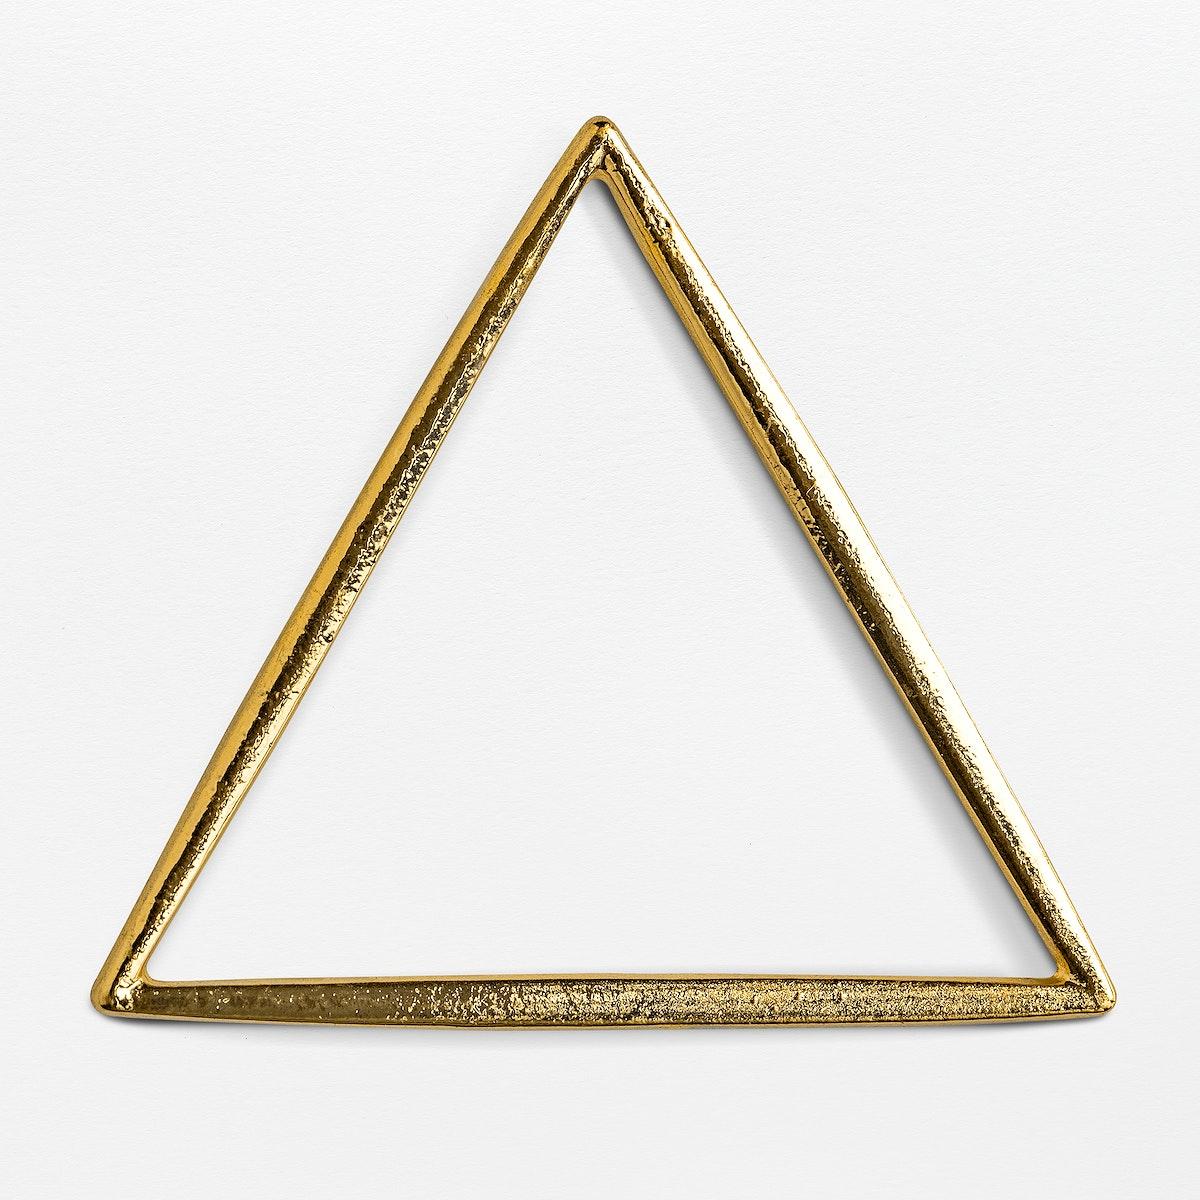 Shiny golden triangle frame design